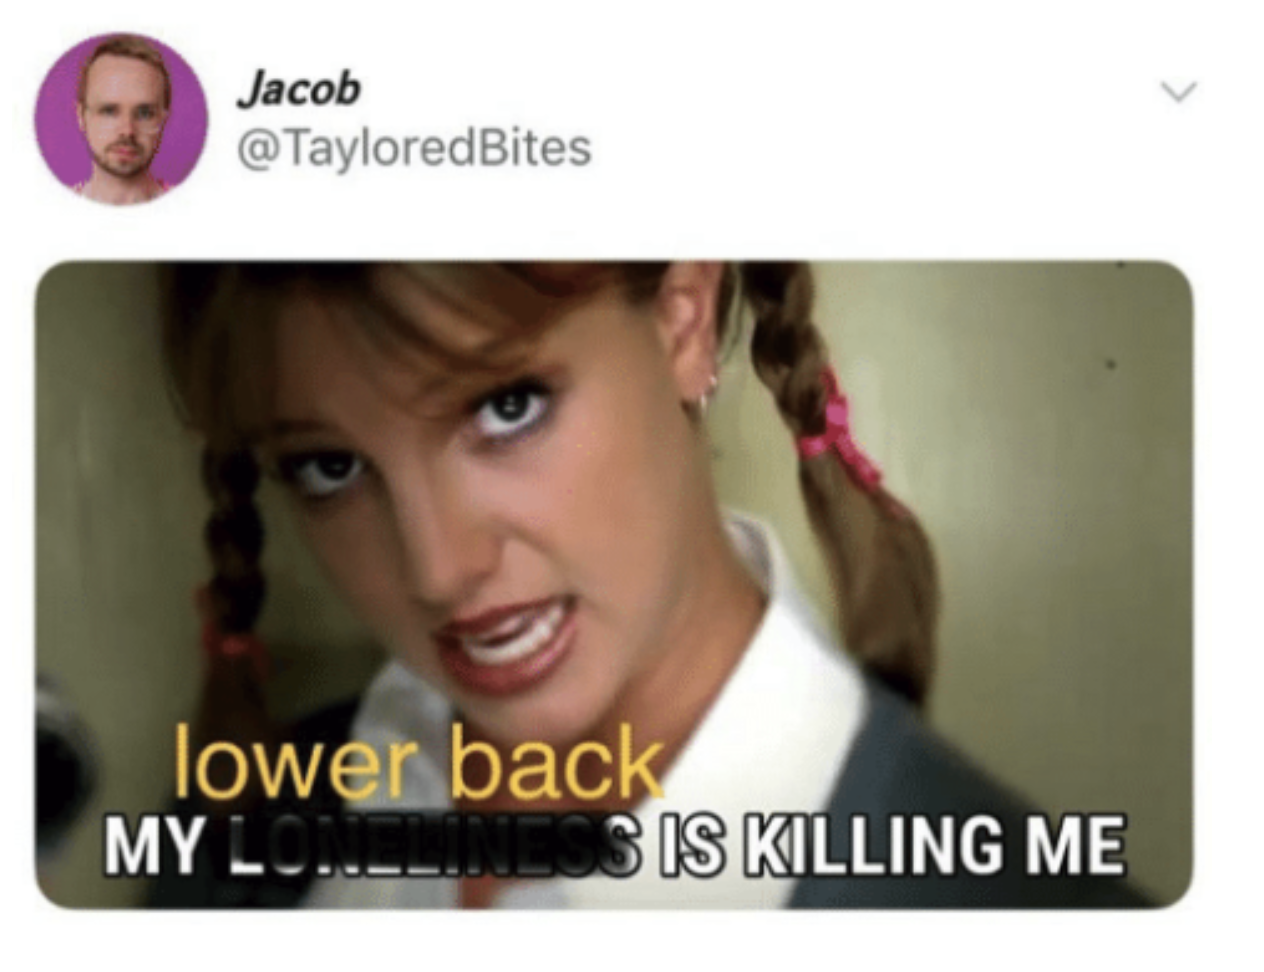 tweet about lower backs hurting